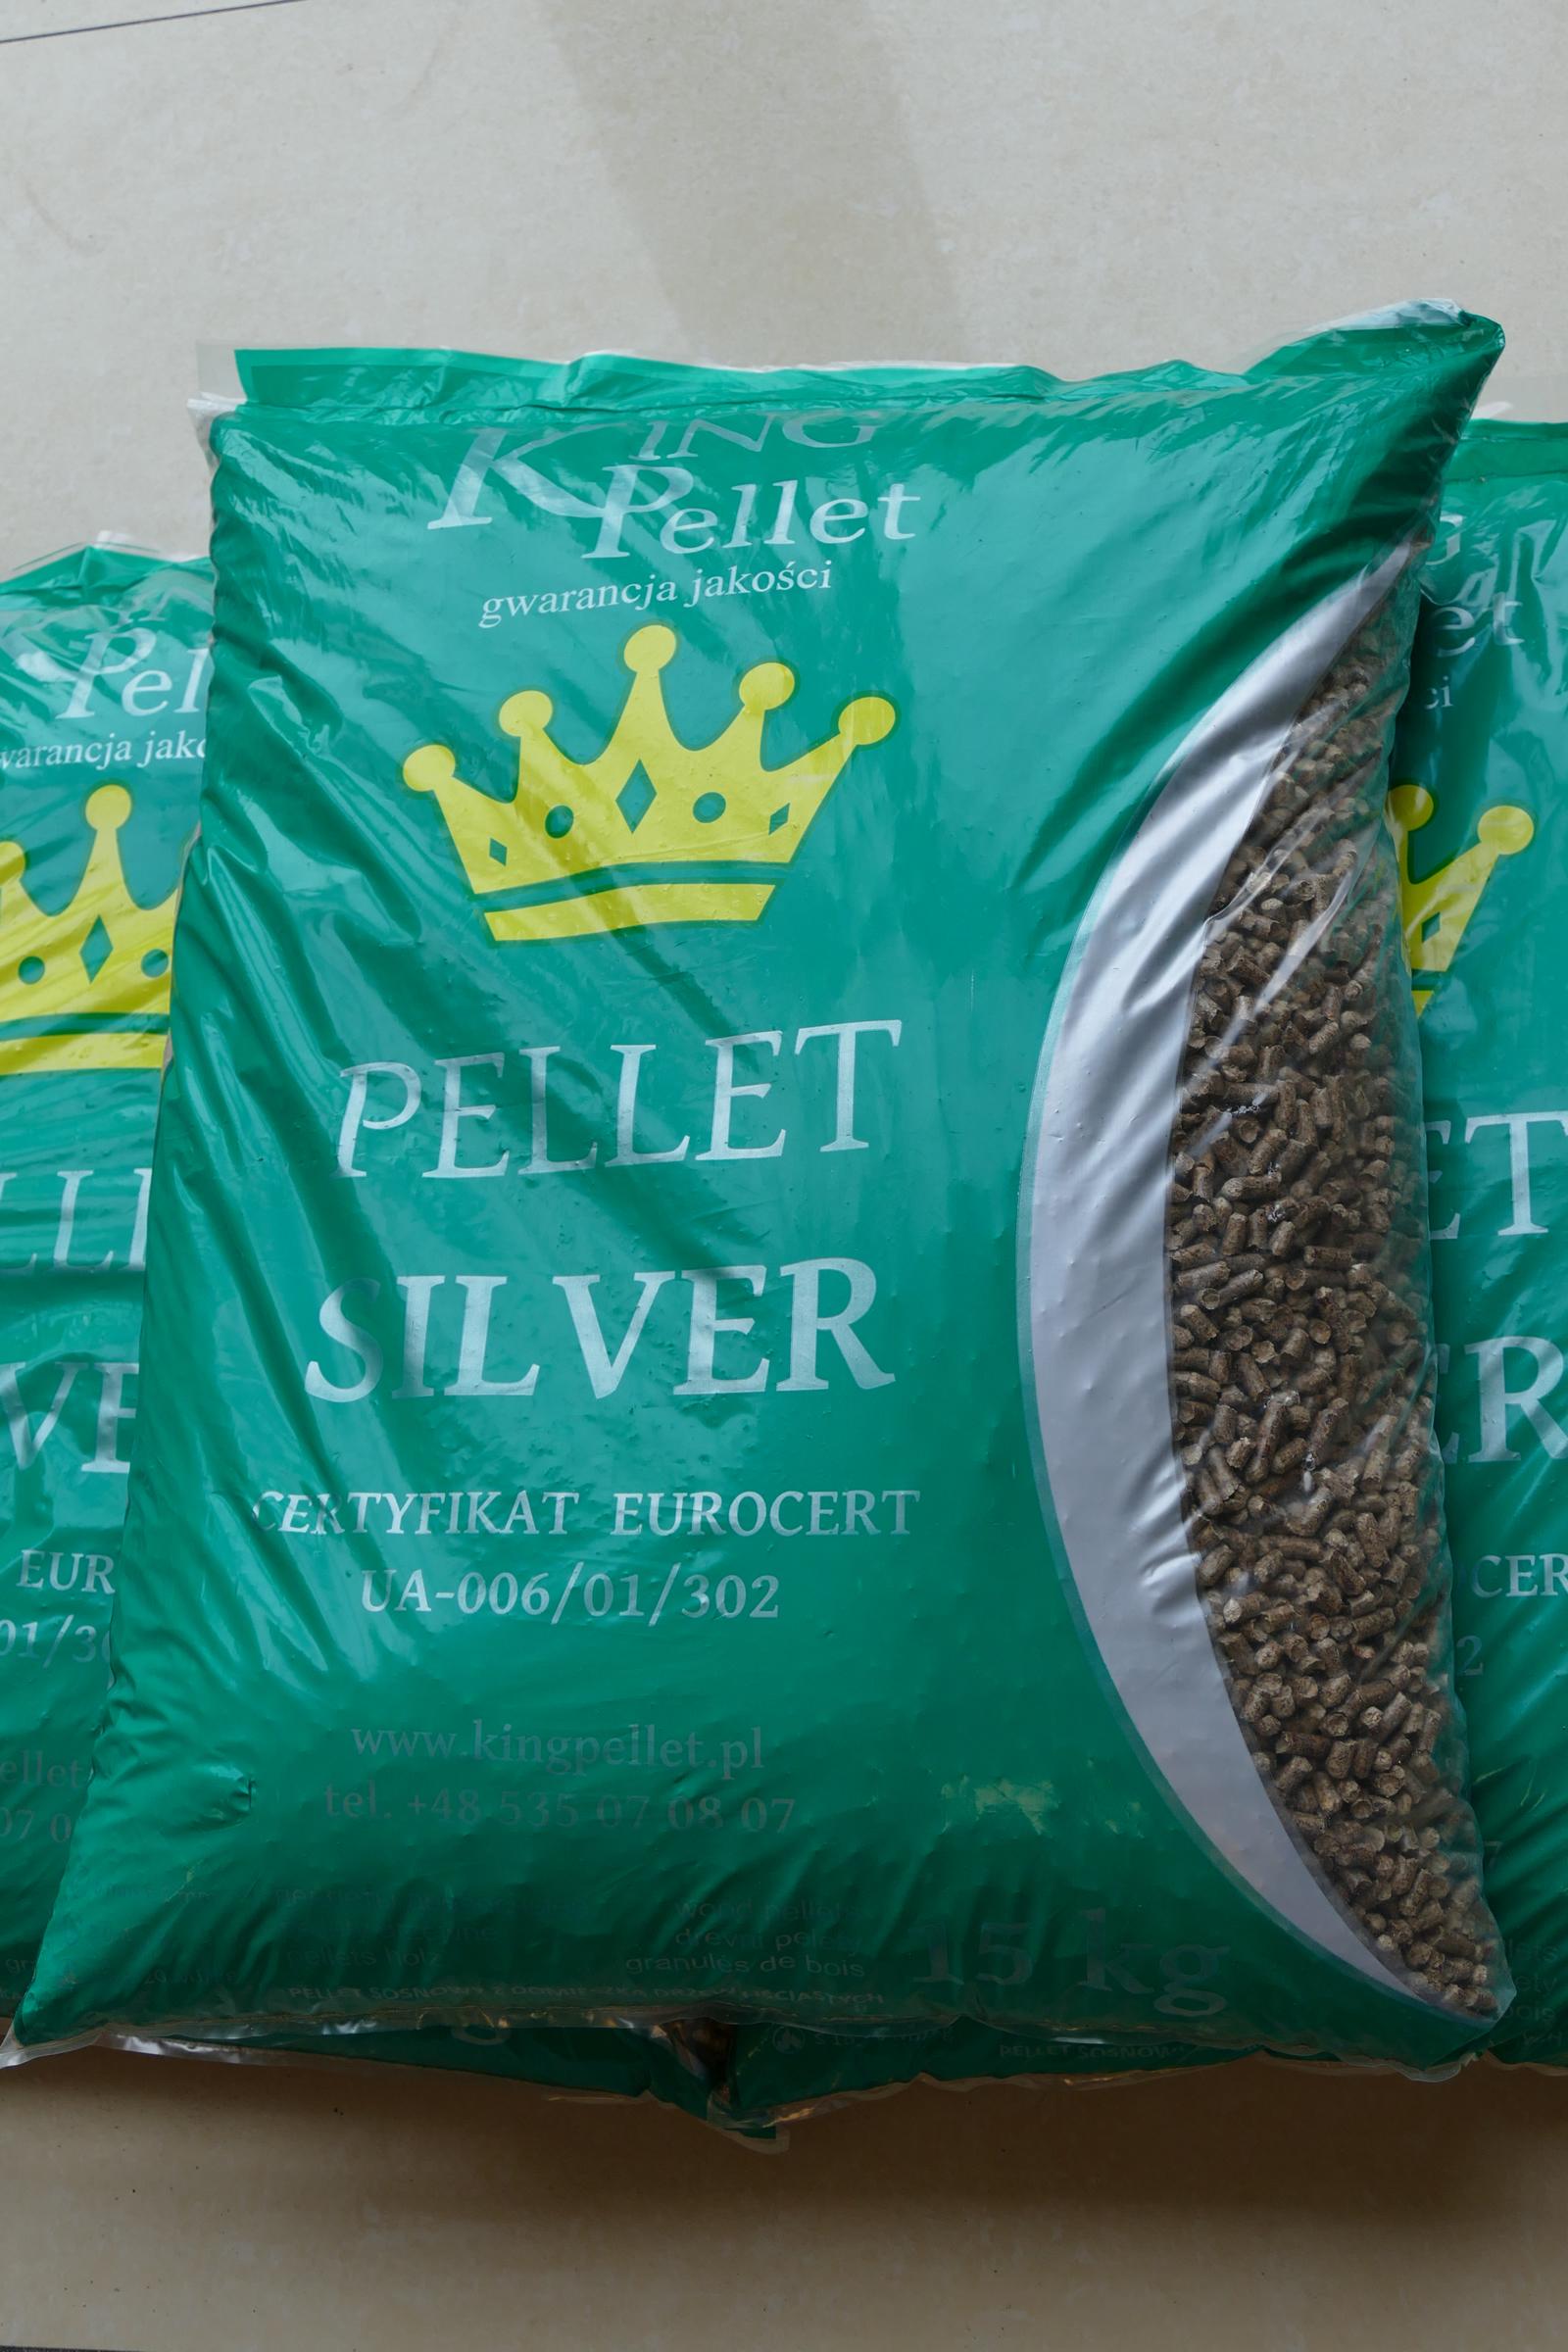 Groovy King Pellet - dobry pellet sosnowy, pellet w atrakcyjnej cenie UI29